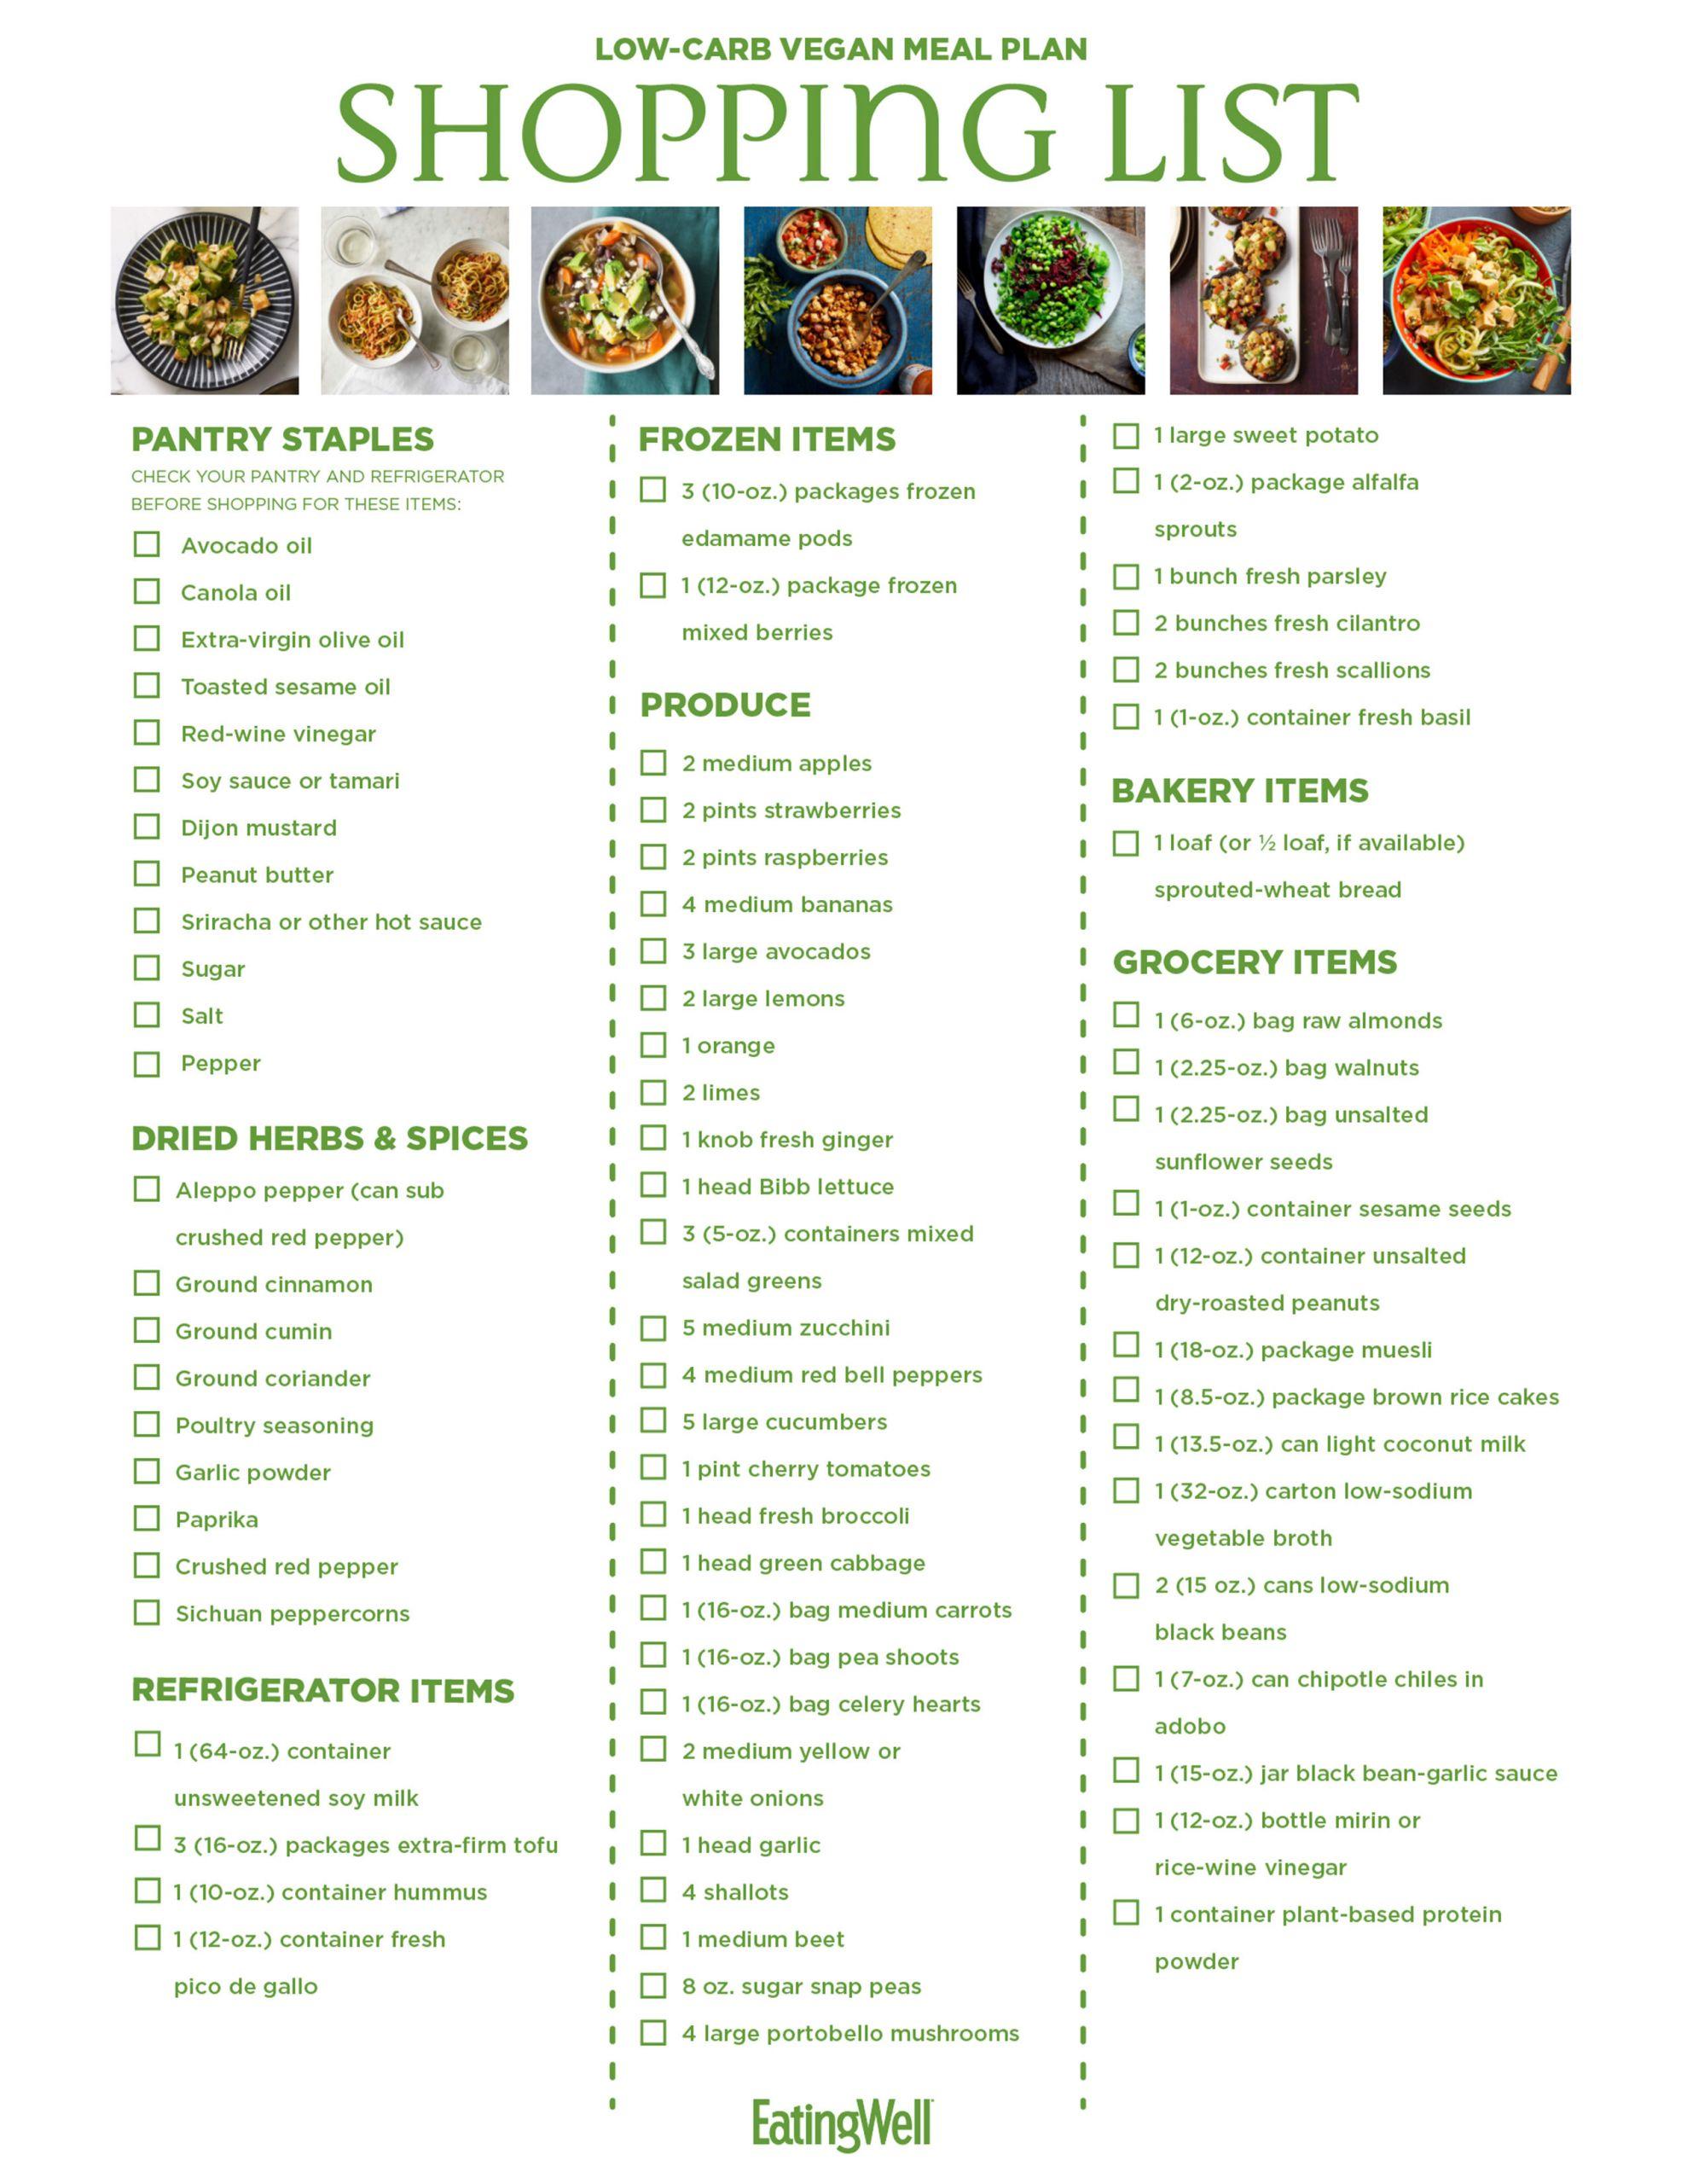 Low Carb Vegan Diet Plan  Low Carb Vegan Meal Plan 1 200 Calories